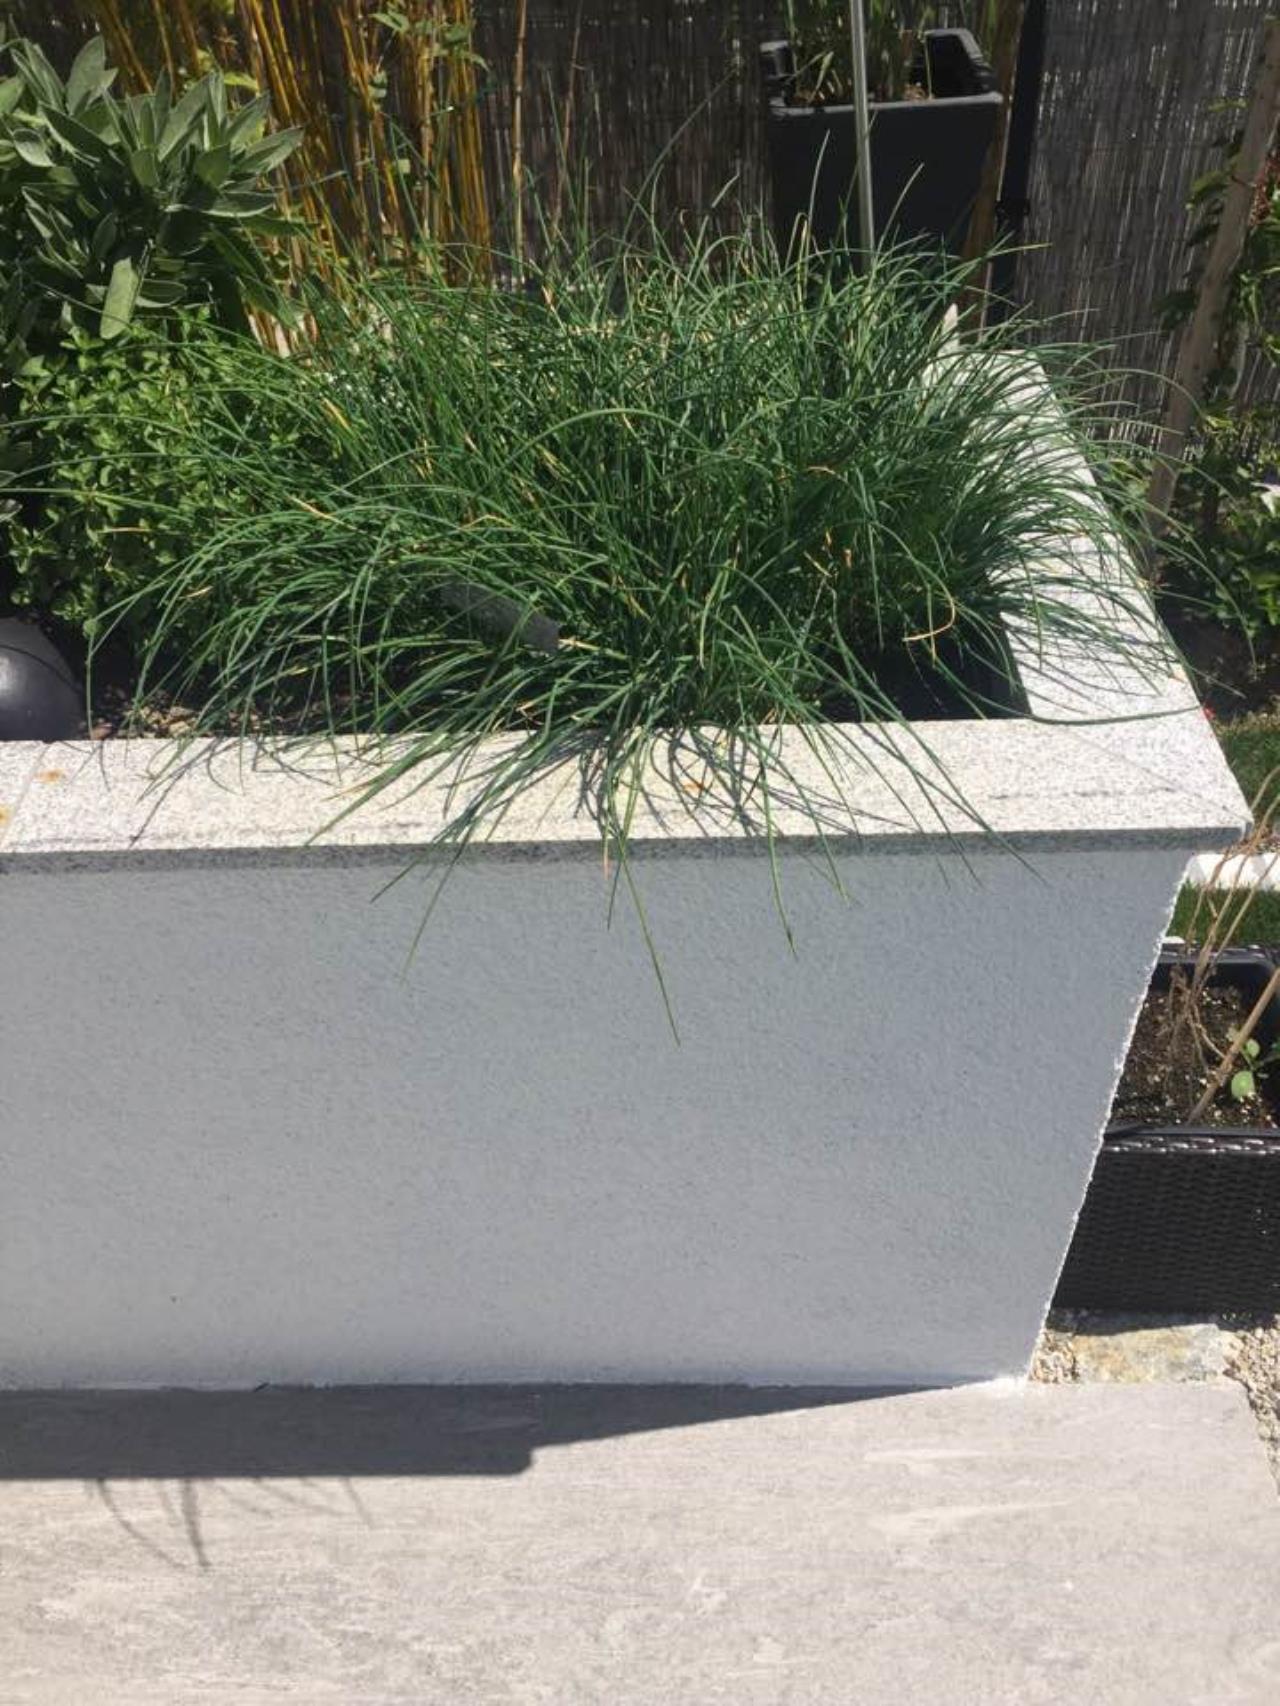 hochbeet bepflanzen gem se 1 jahr ostseesuche com. Black Bedroom Furniture Sets. Home Design Ideas